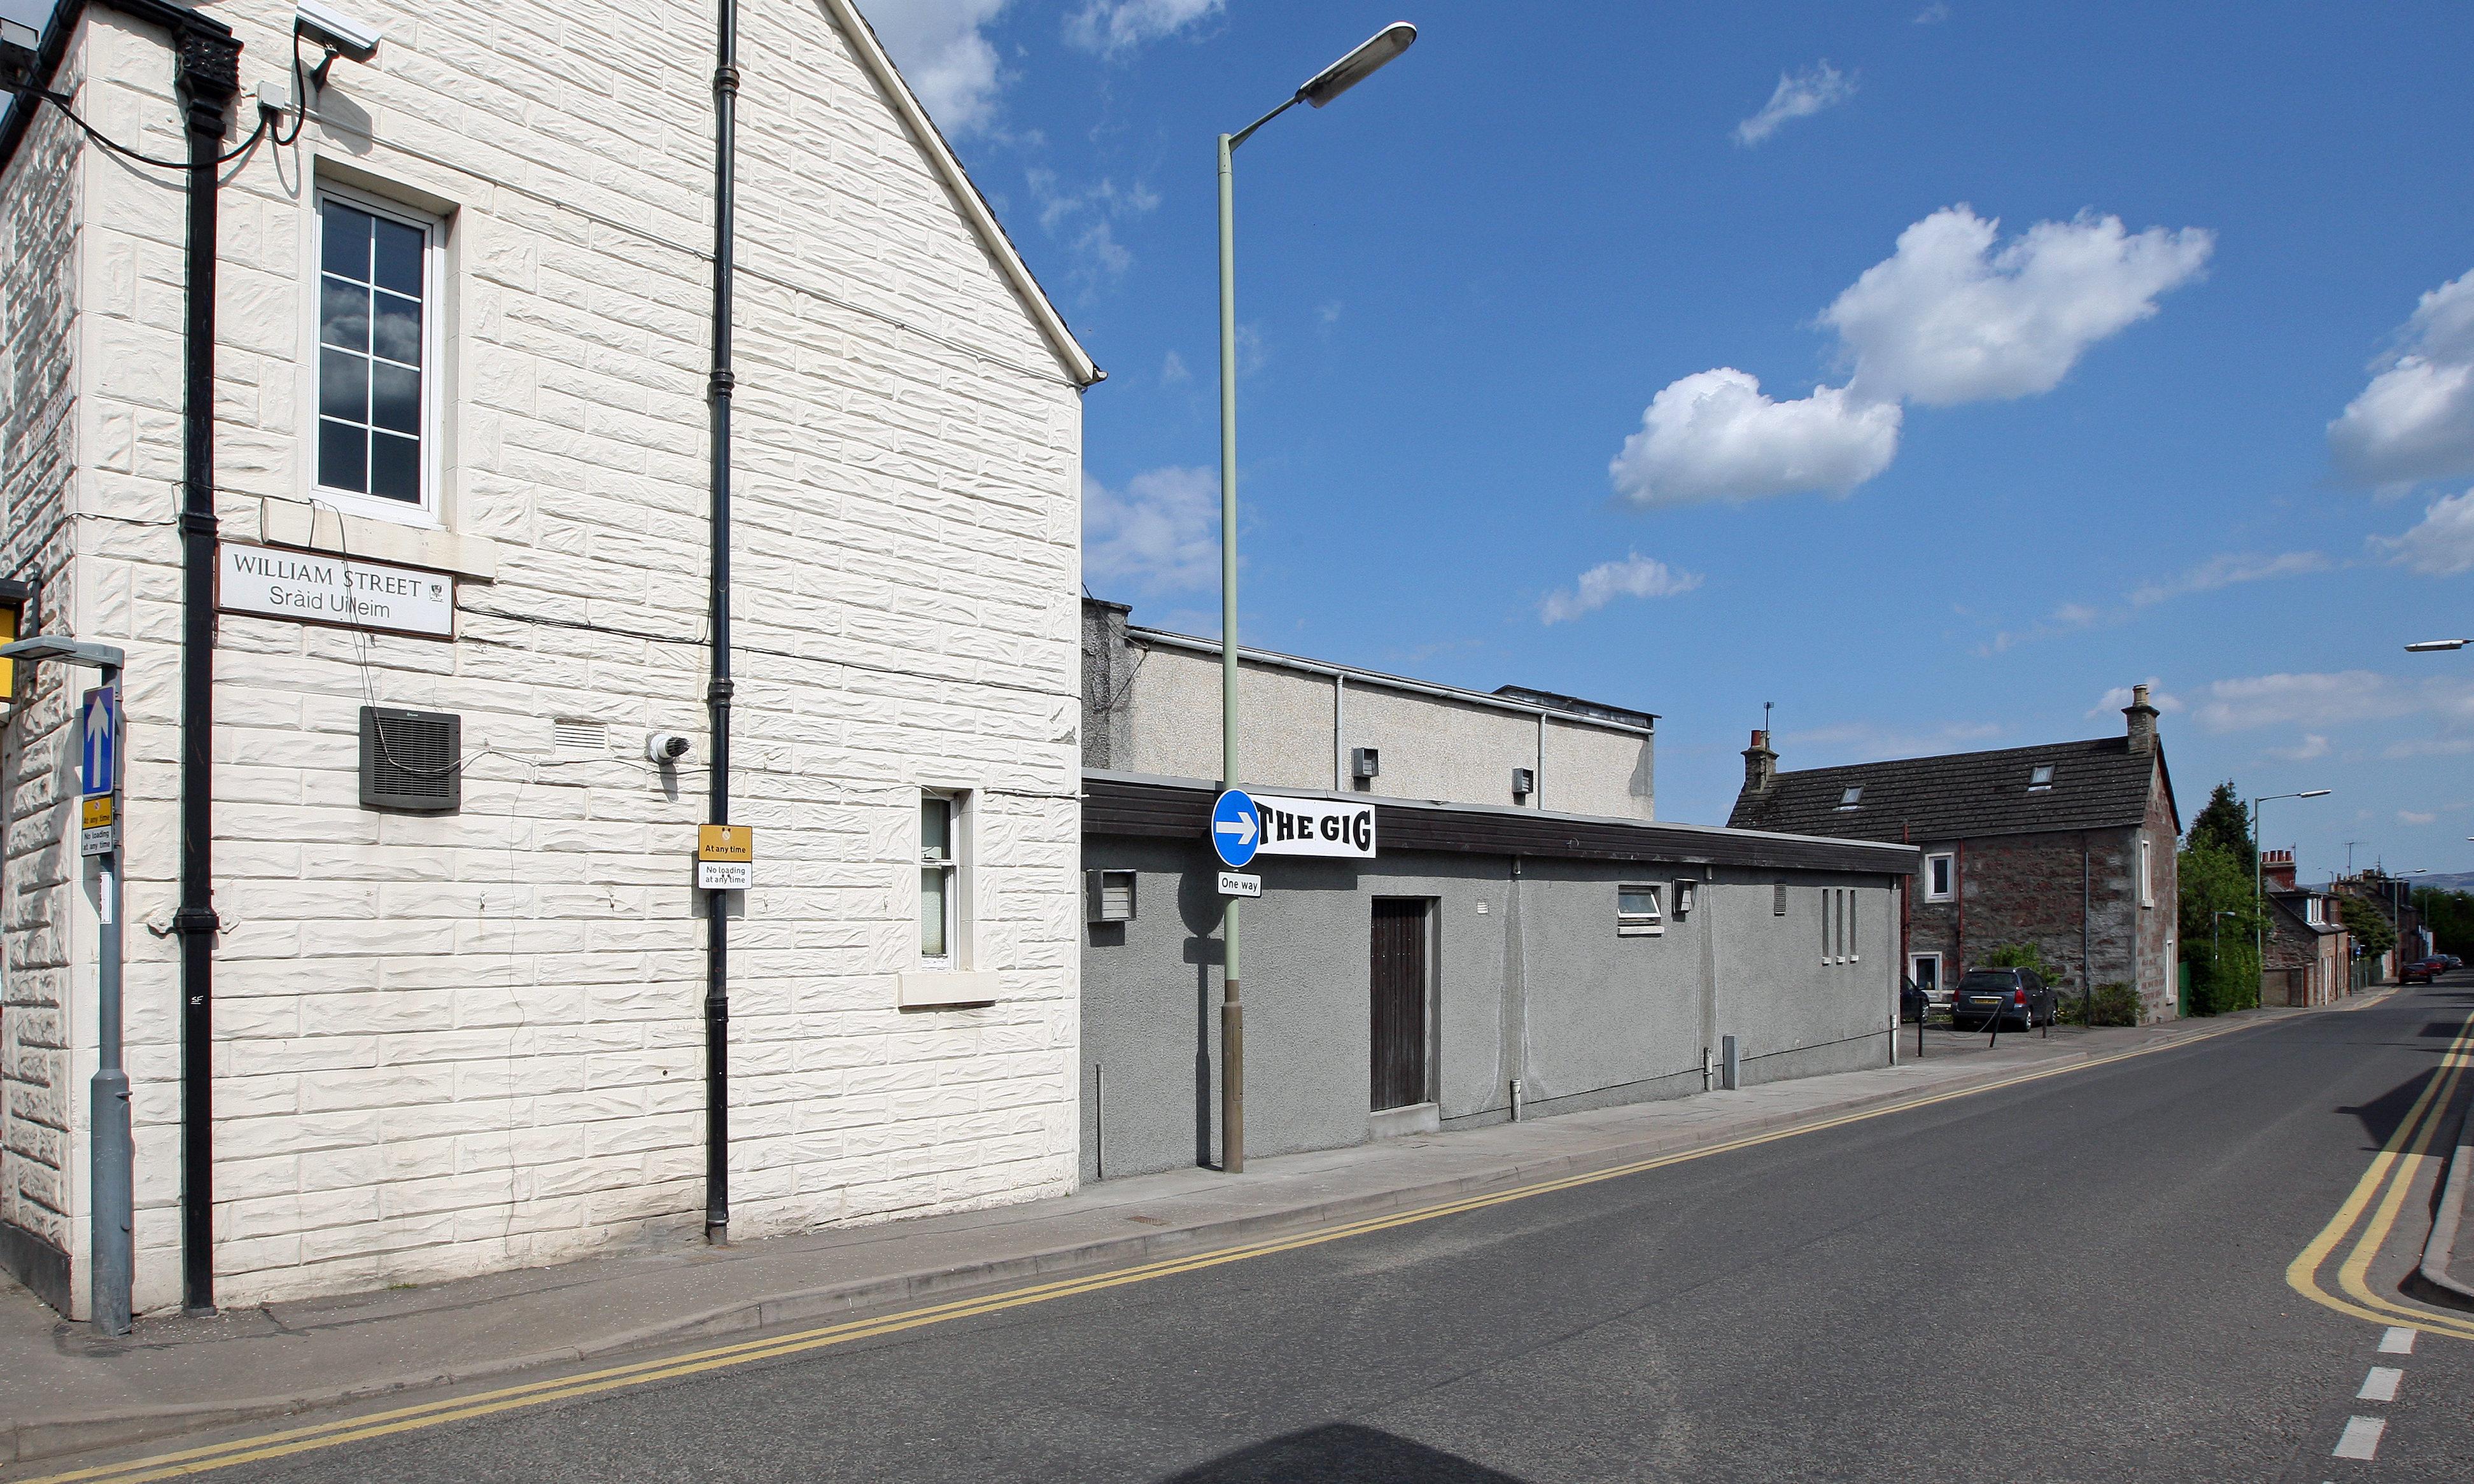 The Gig nightclub, William Street, Blairgowrie.